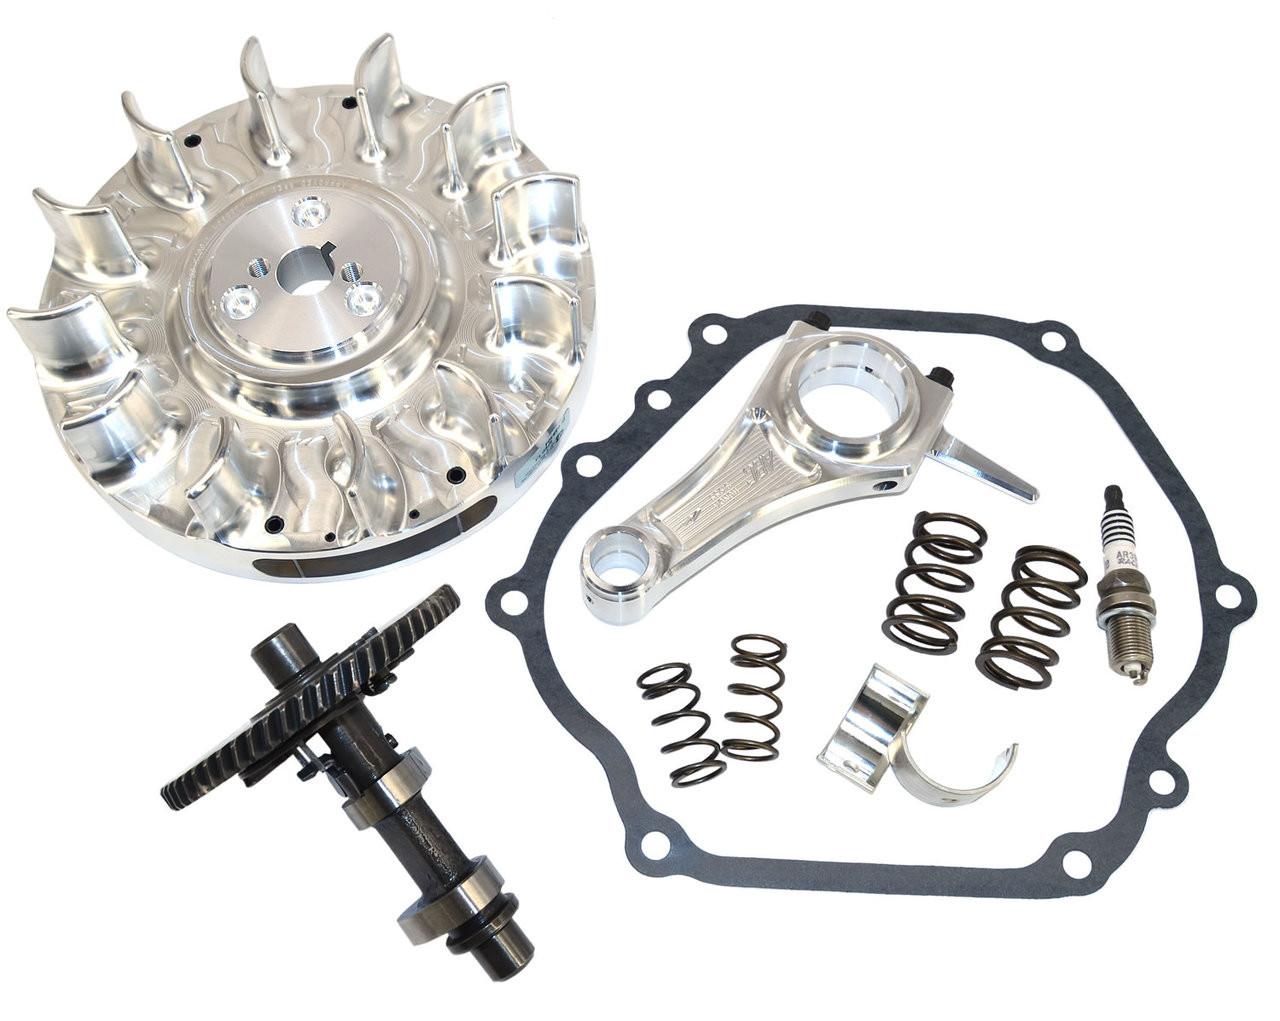 Stage 2: 301cc Hemi Predator / GX240-GX270 Performance Kit